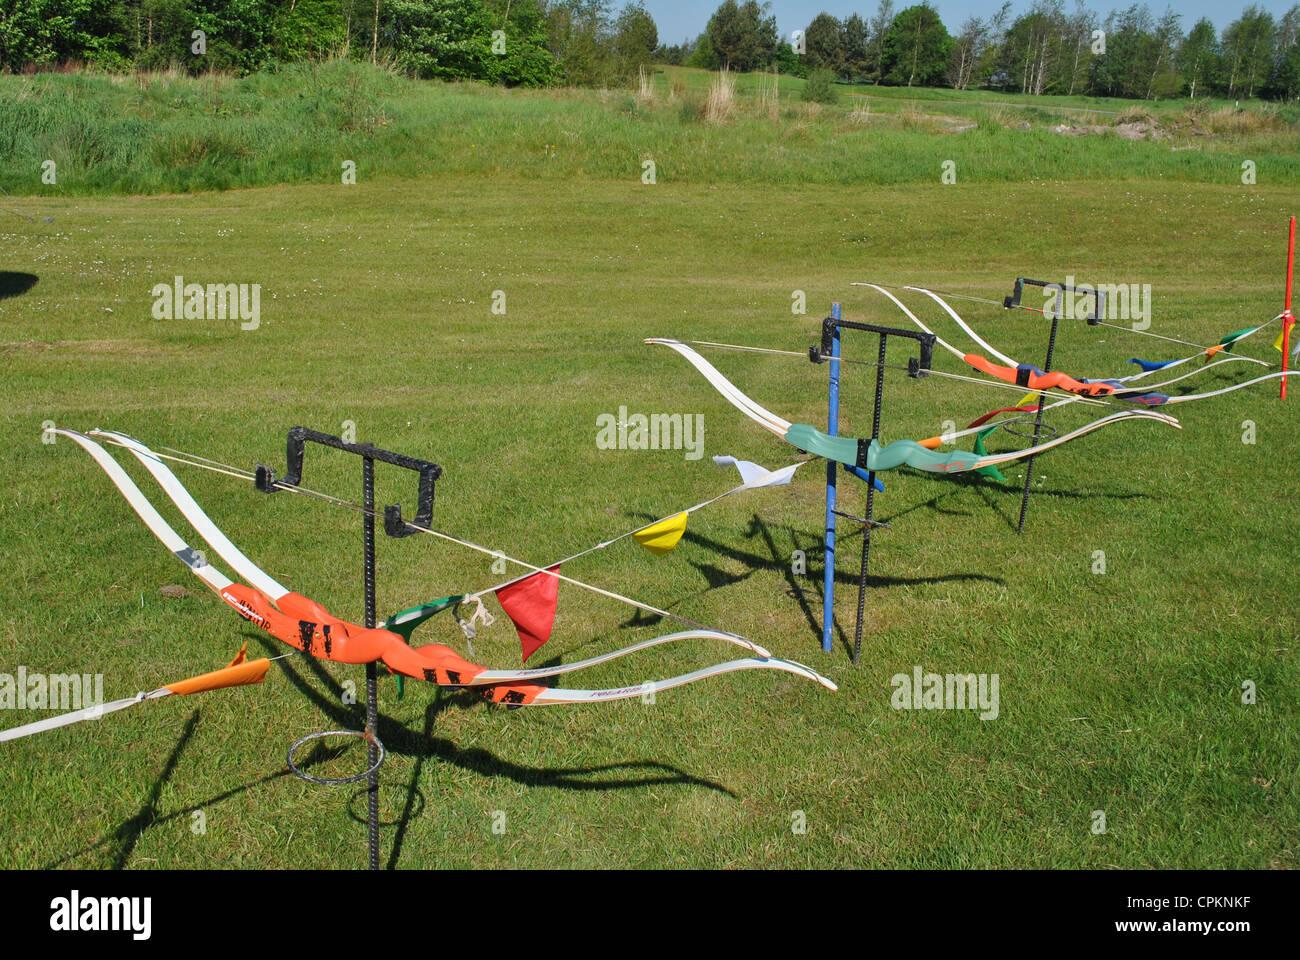 archery bows - Stock Image